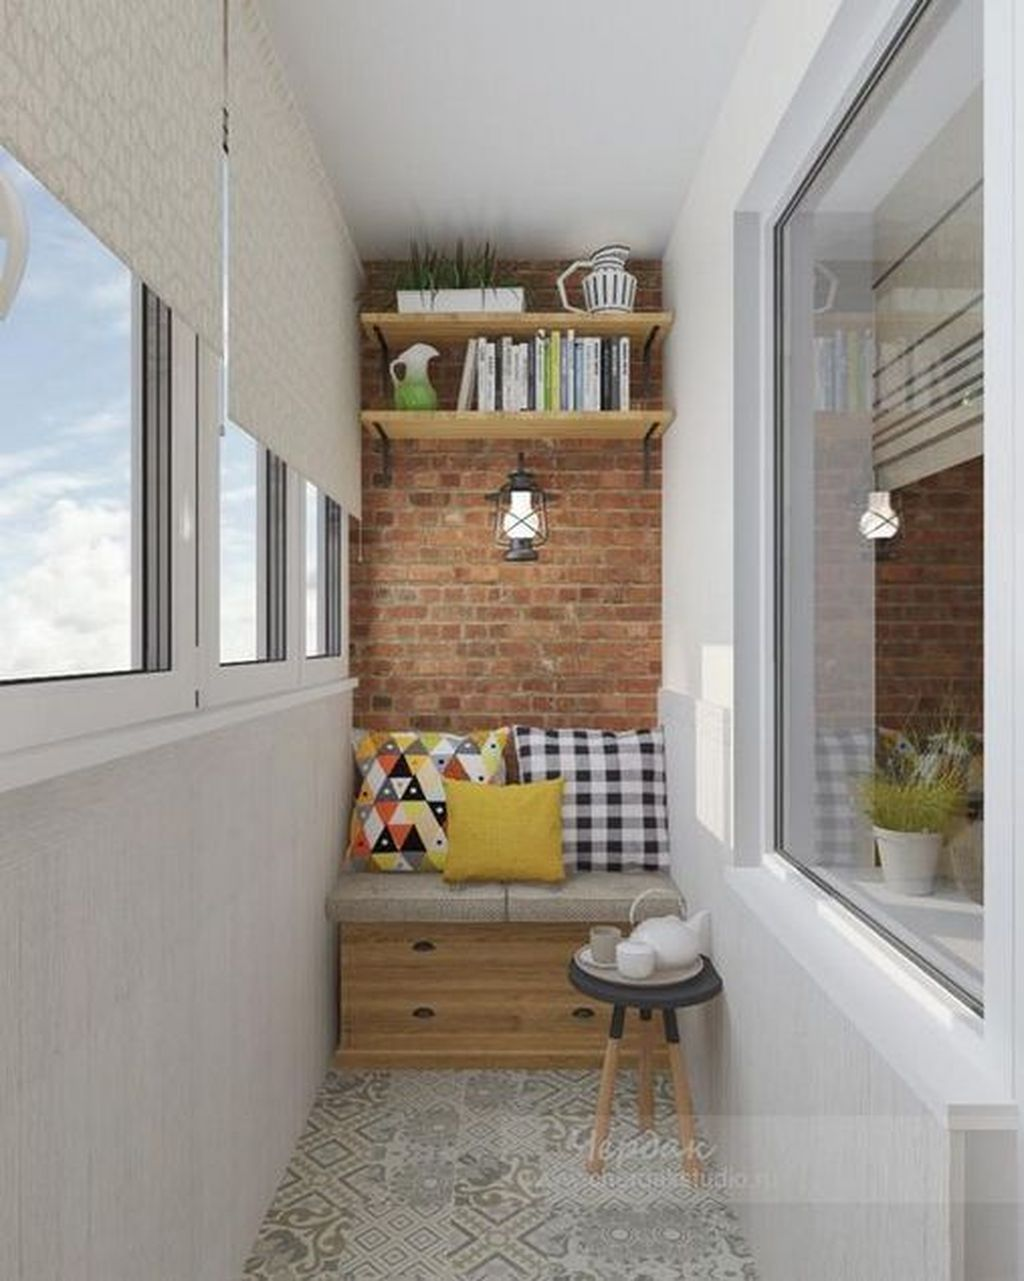 40 Chic Apartment Small Balcony Design Ideas For You Balcony Furniture Apartment Balcony Decorating Small Balcony Design